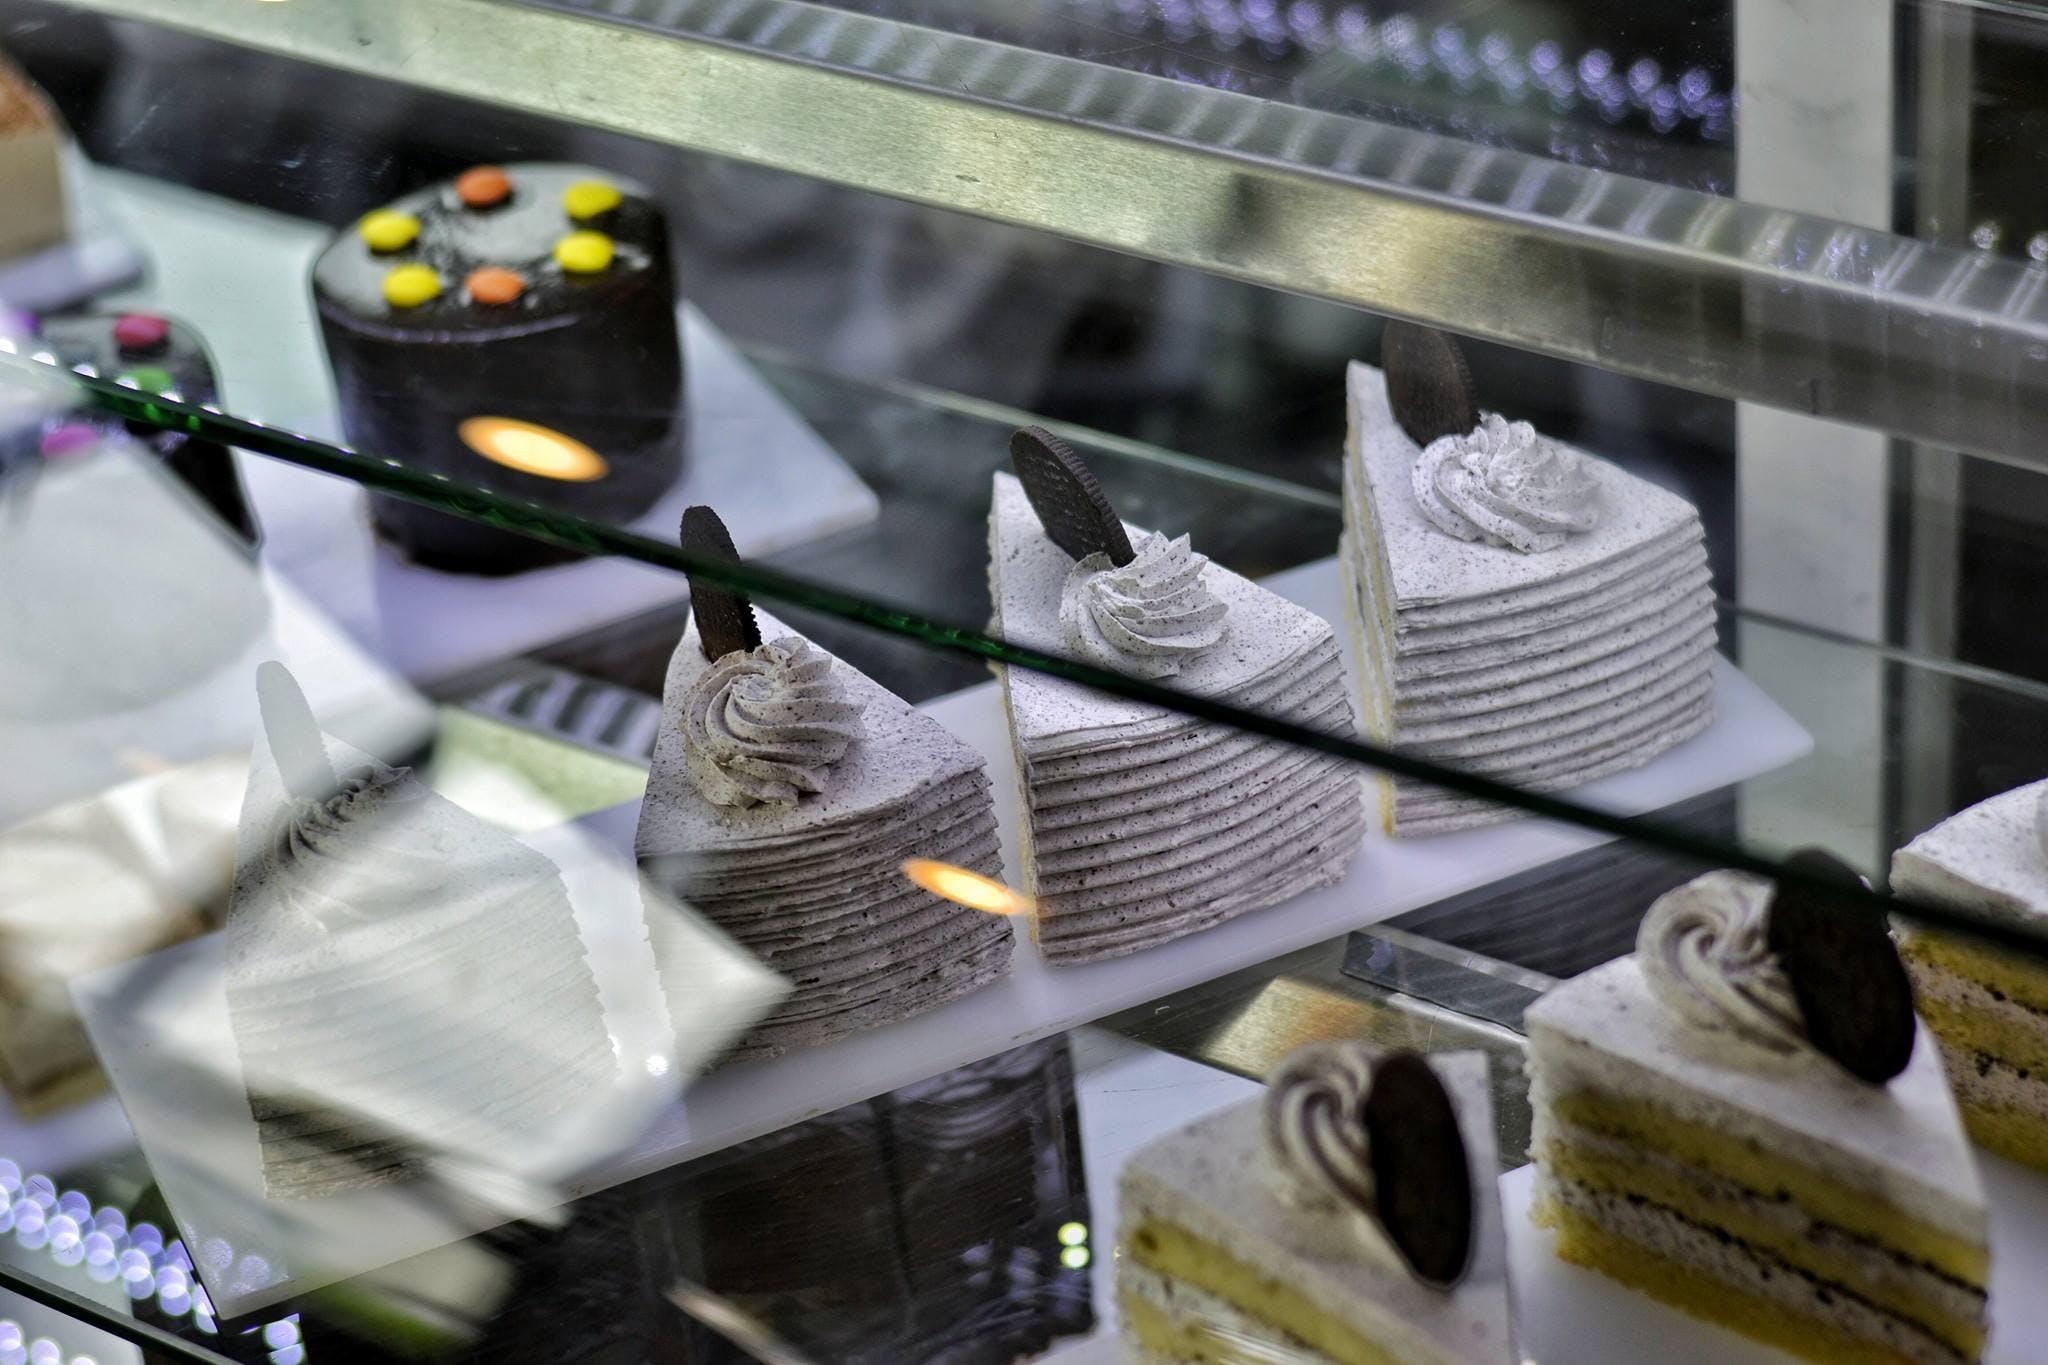 Several Cake Slices